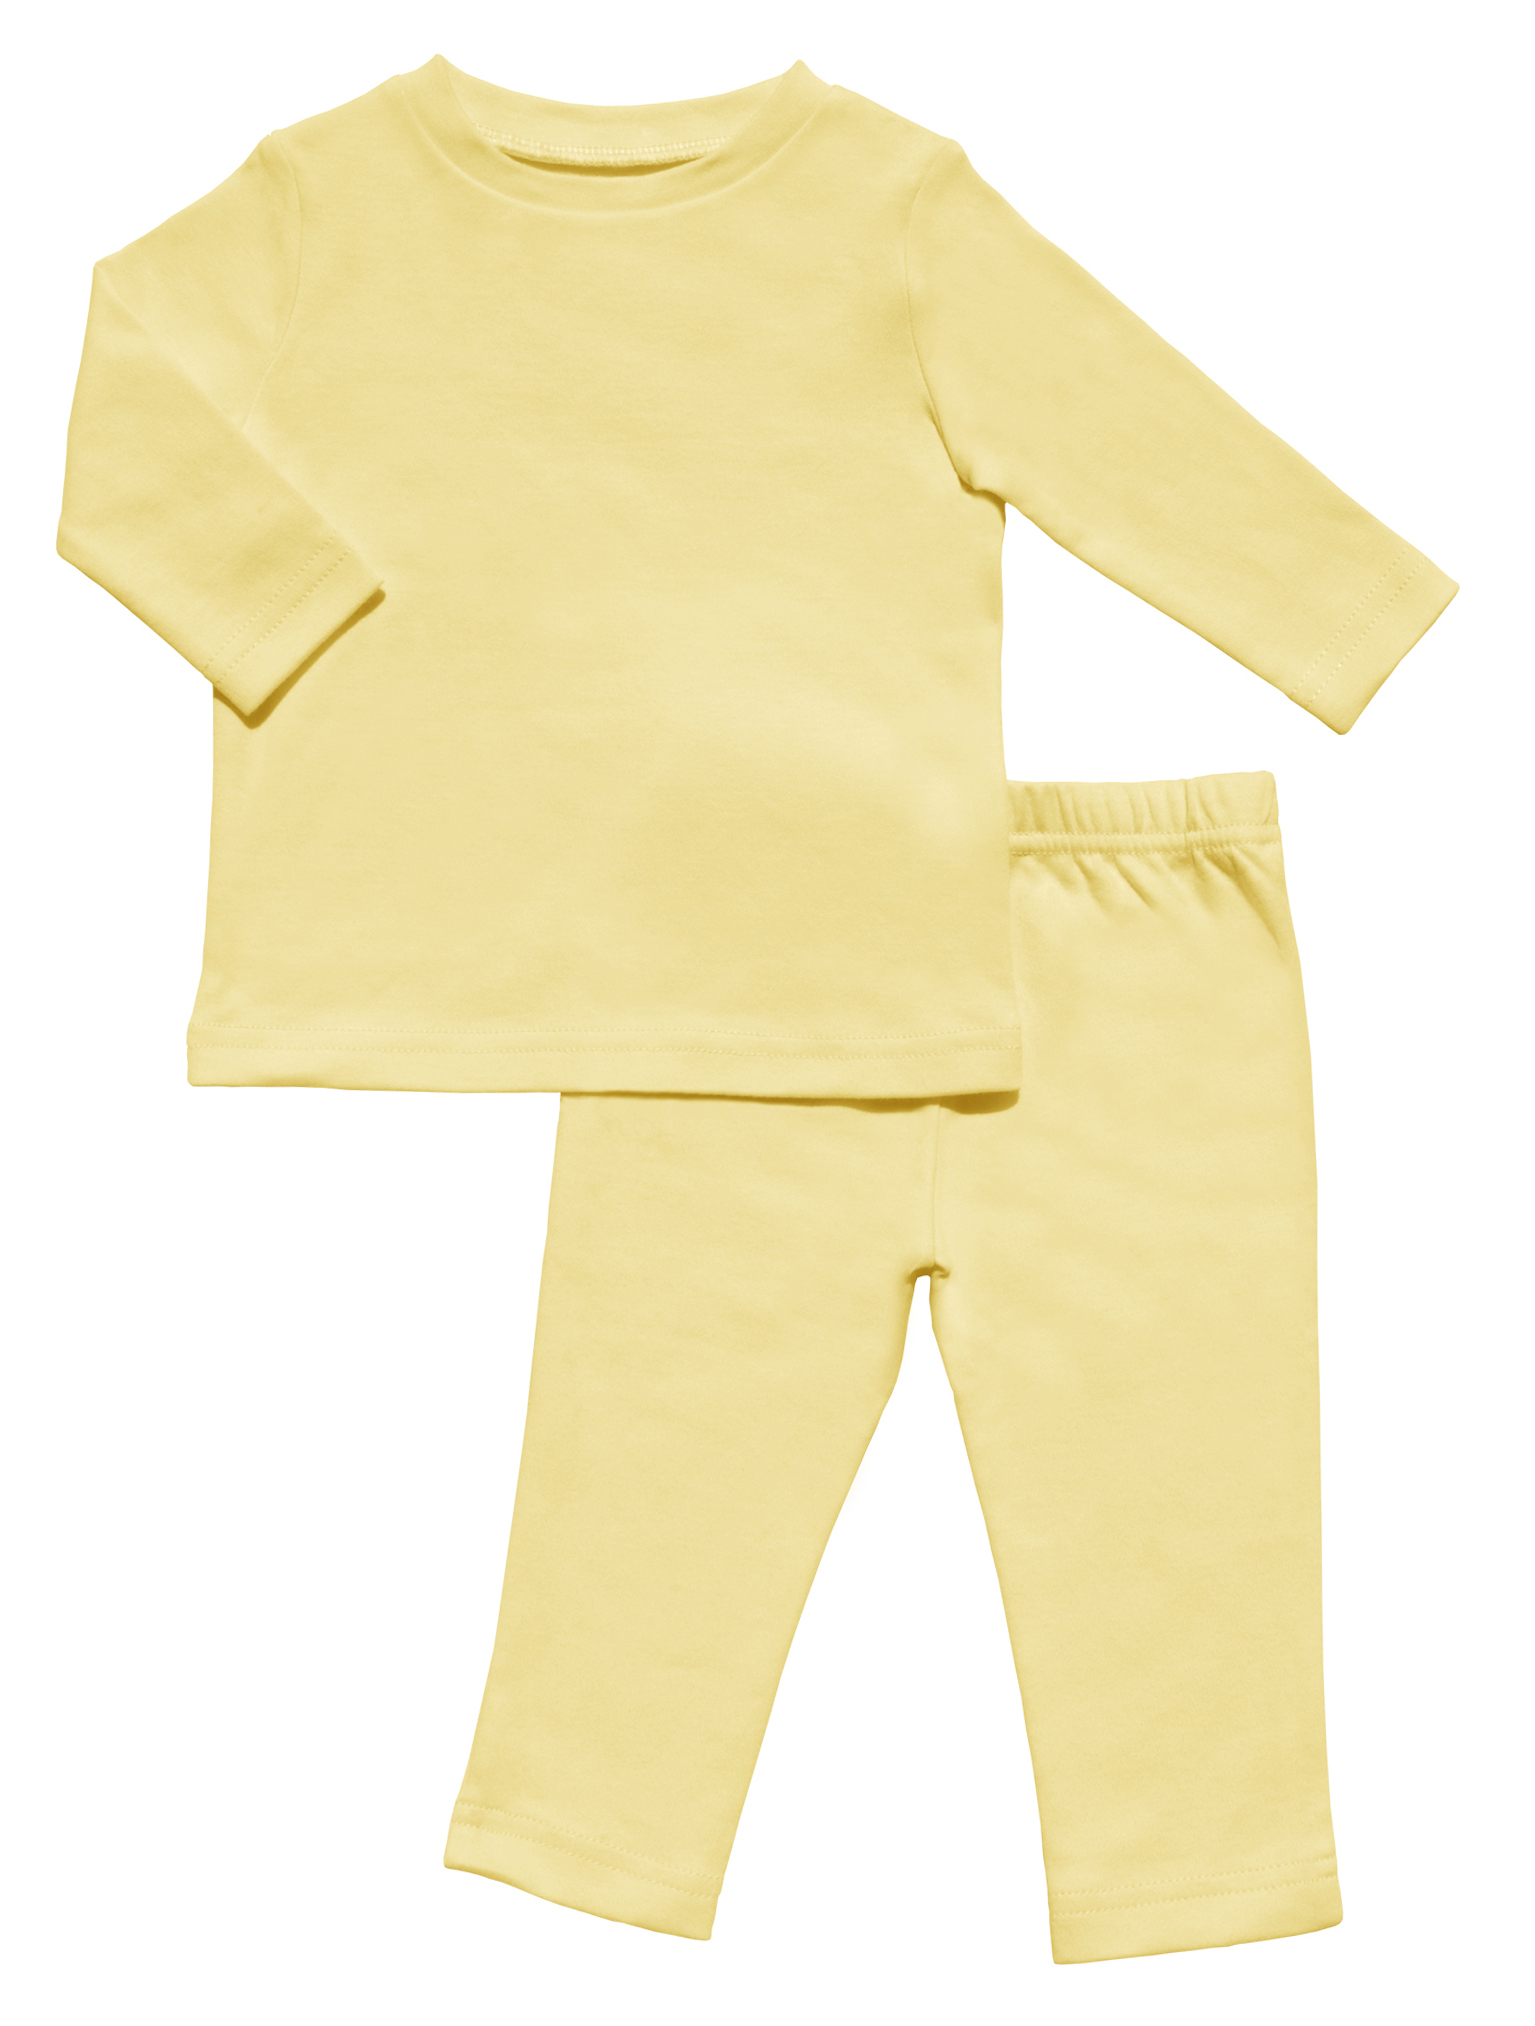 KidzStuff Baby Sun Protection Shirt and Pants Sett (Unisex)